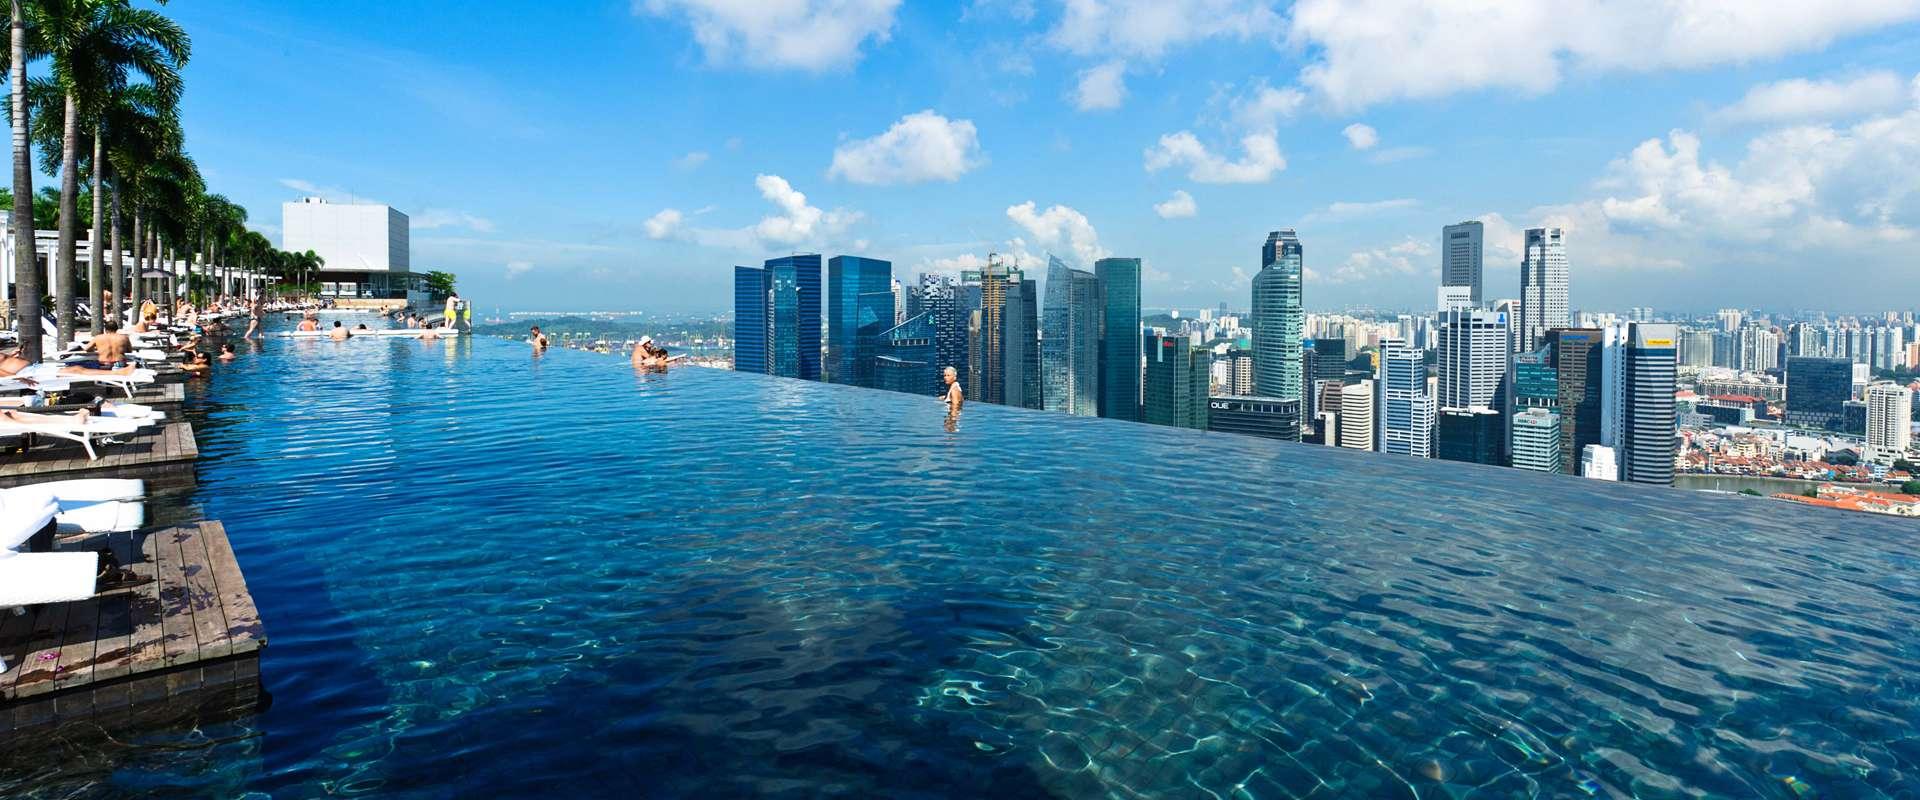 Infinity Pool Singapore Hotel